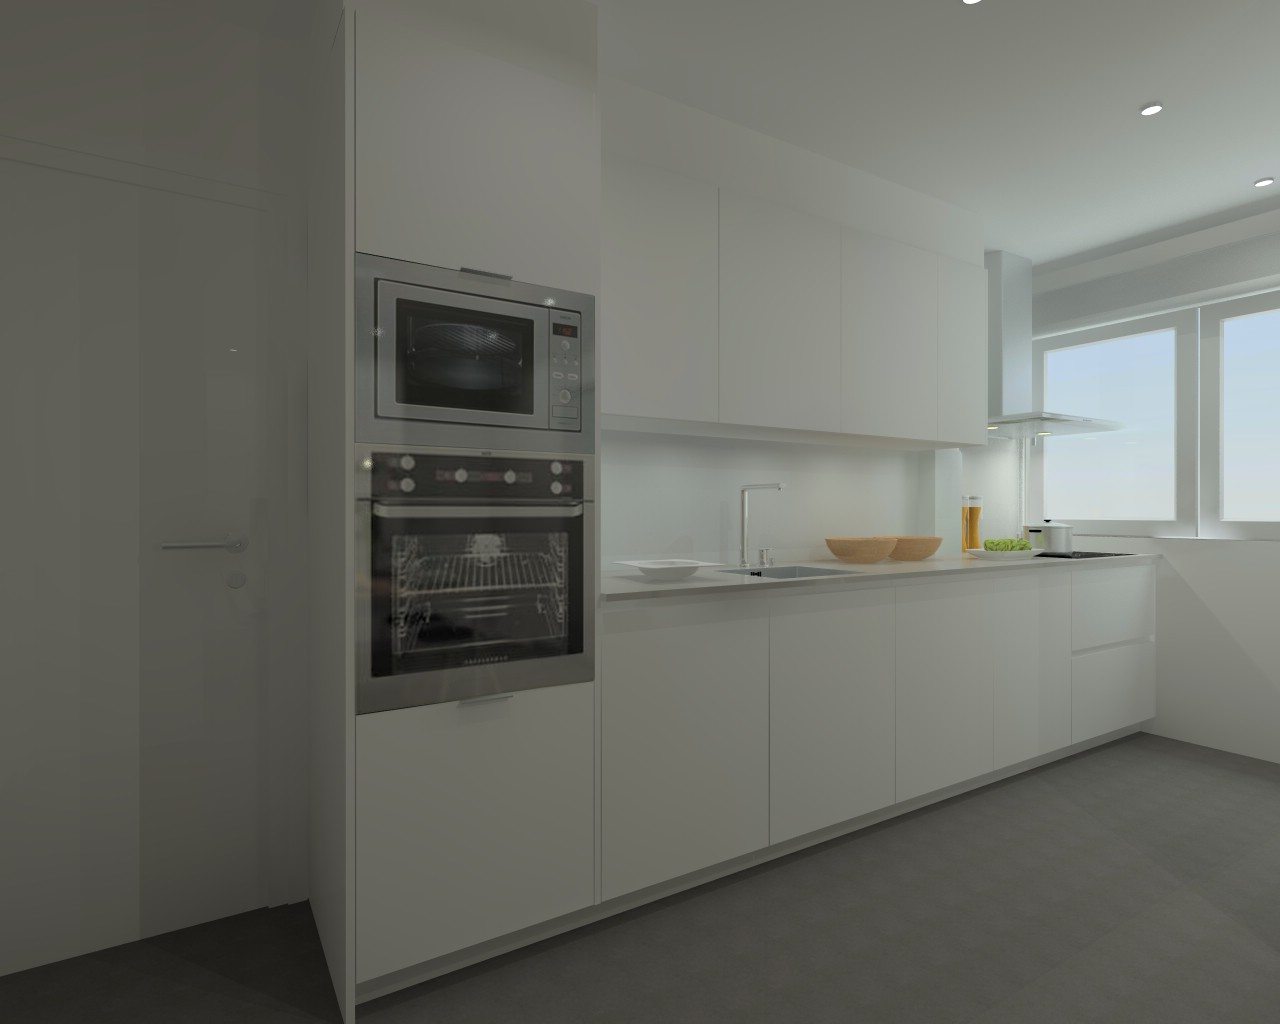 Madrid cocina santos modelo line e encimera techlam - Docrys cocinas ...